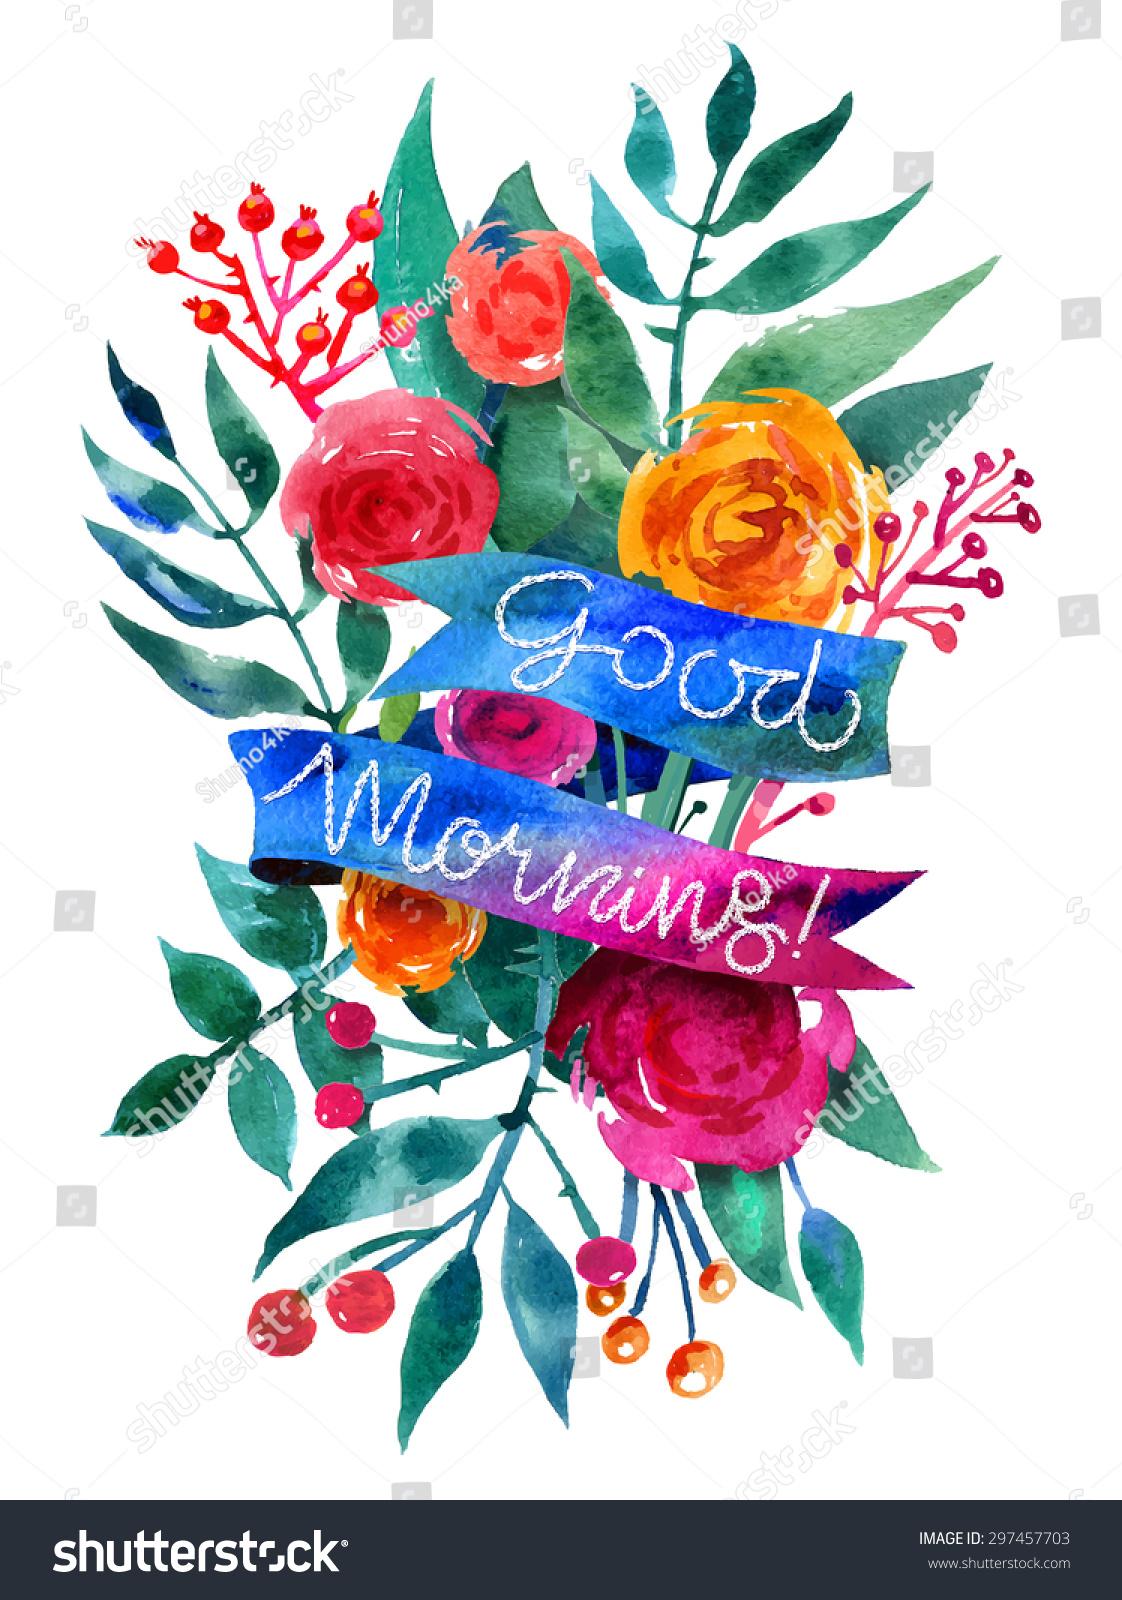 Good morning watercolor flower card beautiful stock vector royalty good morning watercolor flower card beautiful floral greeting card bright illustration invitation card ribbon izmirmasajfo